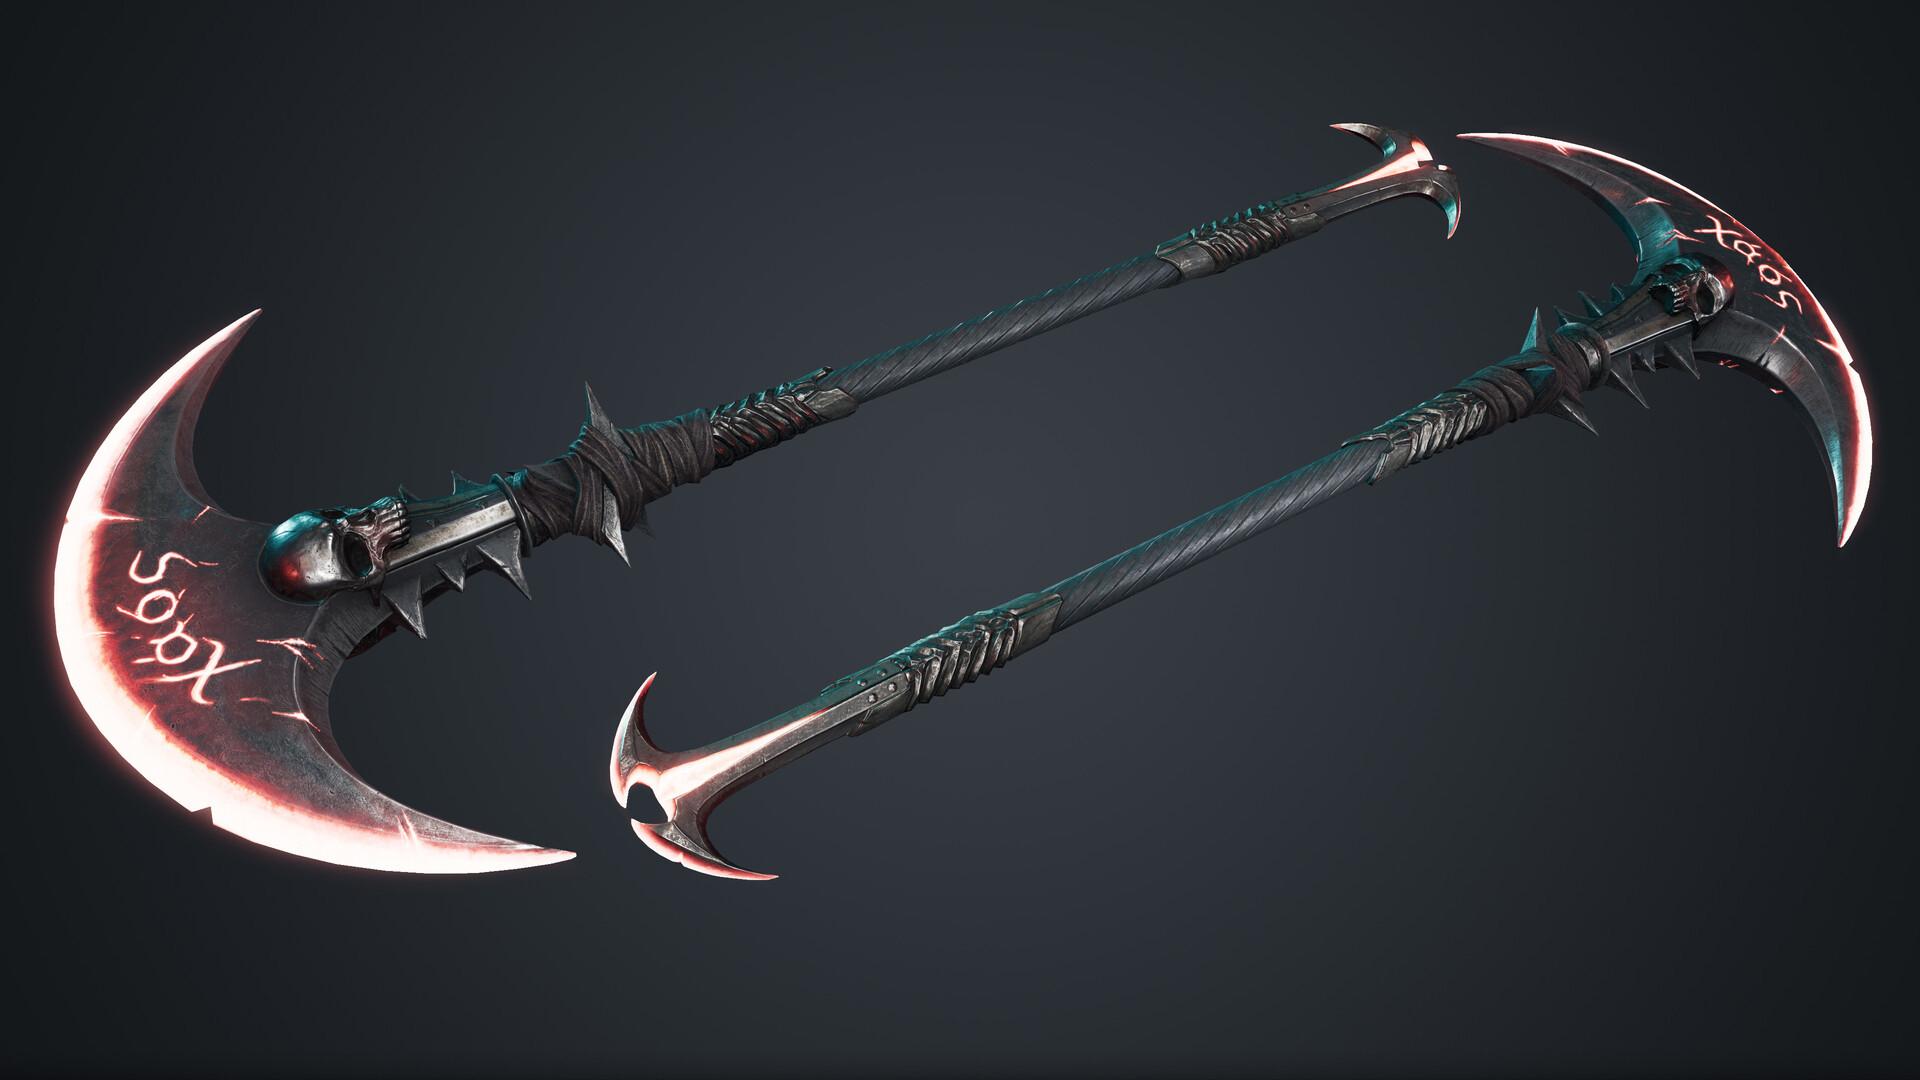 Hades Executioner Assassin S Creed Wiki Fandom